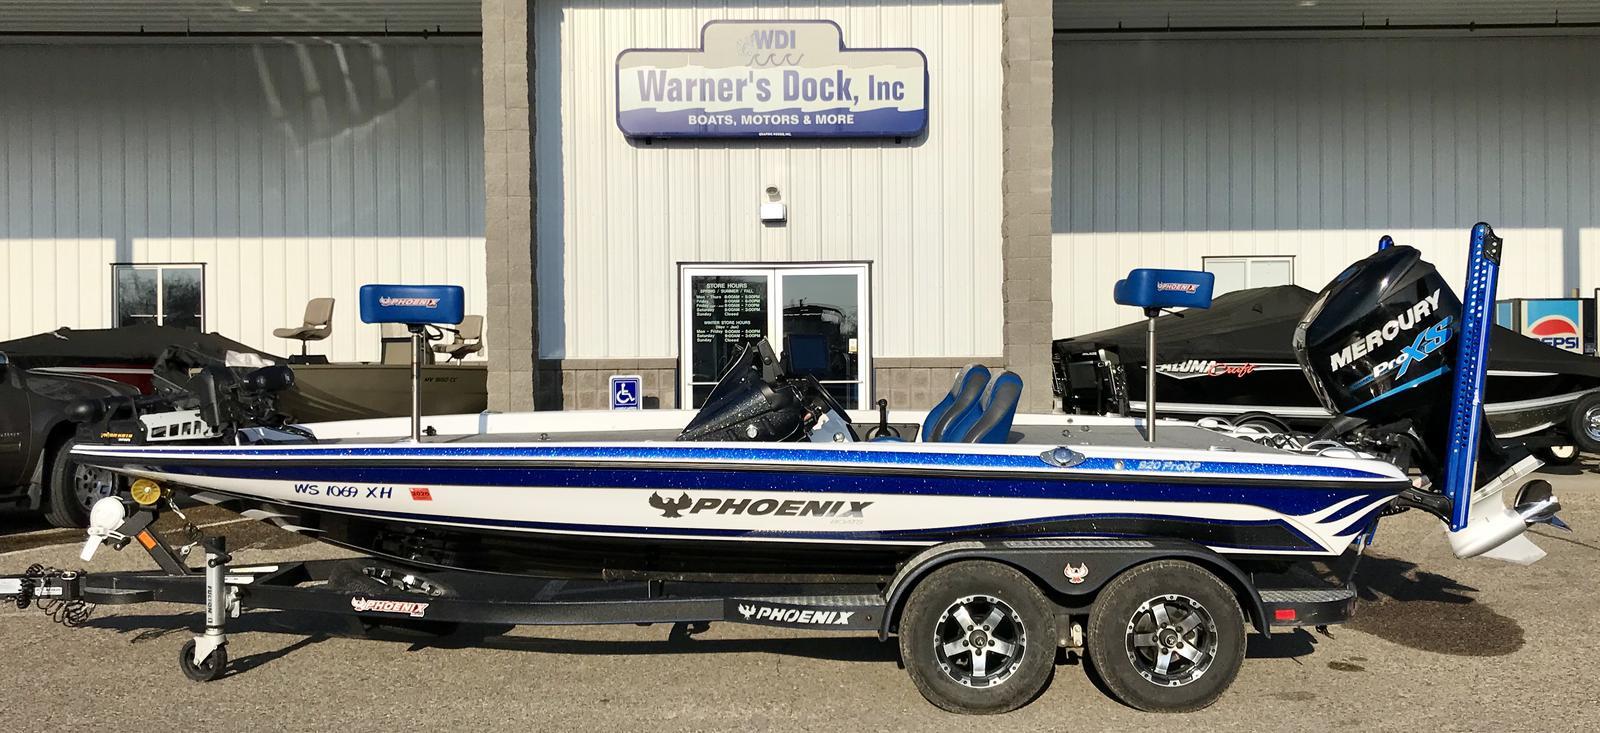 Inventory Warner's Dock Inc  New Richmond, WI (715) 246-6856